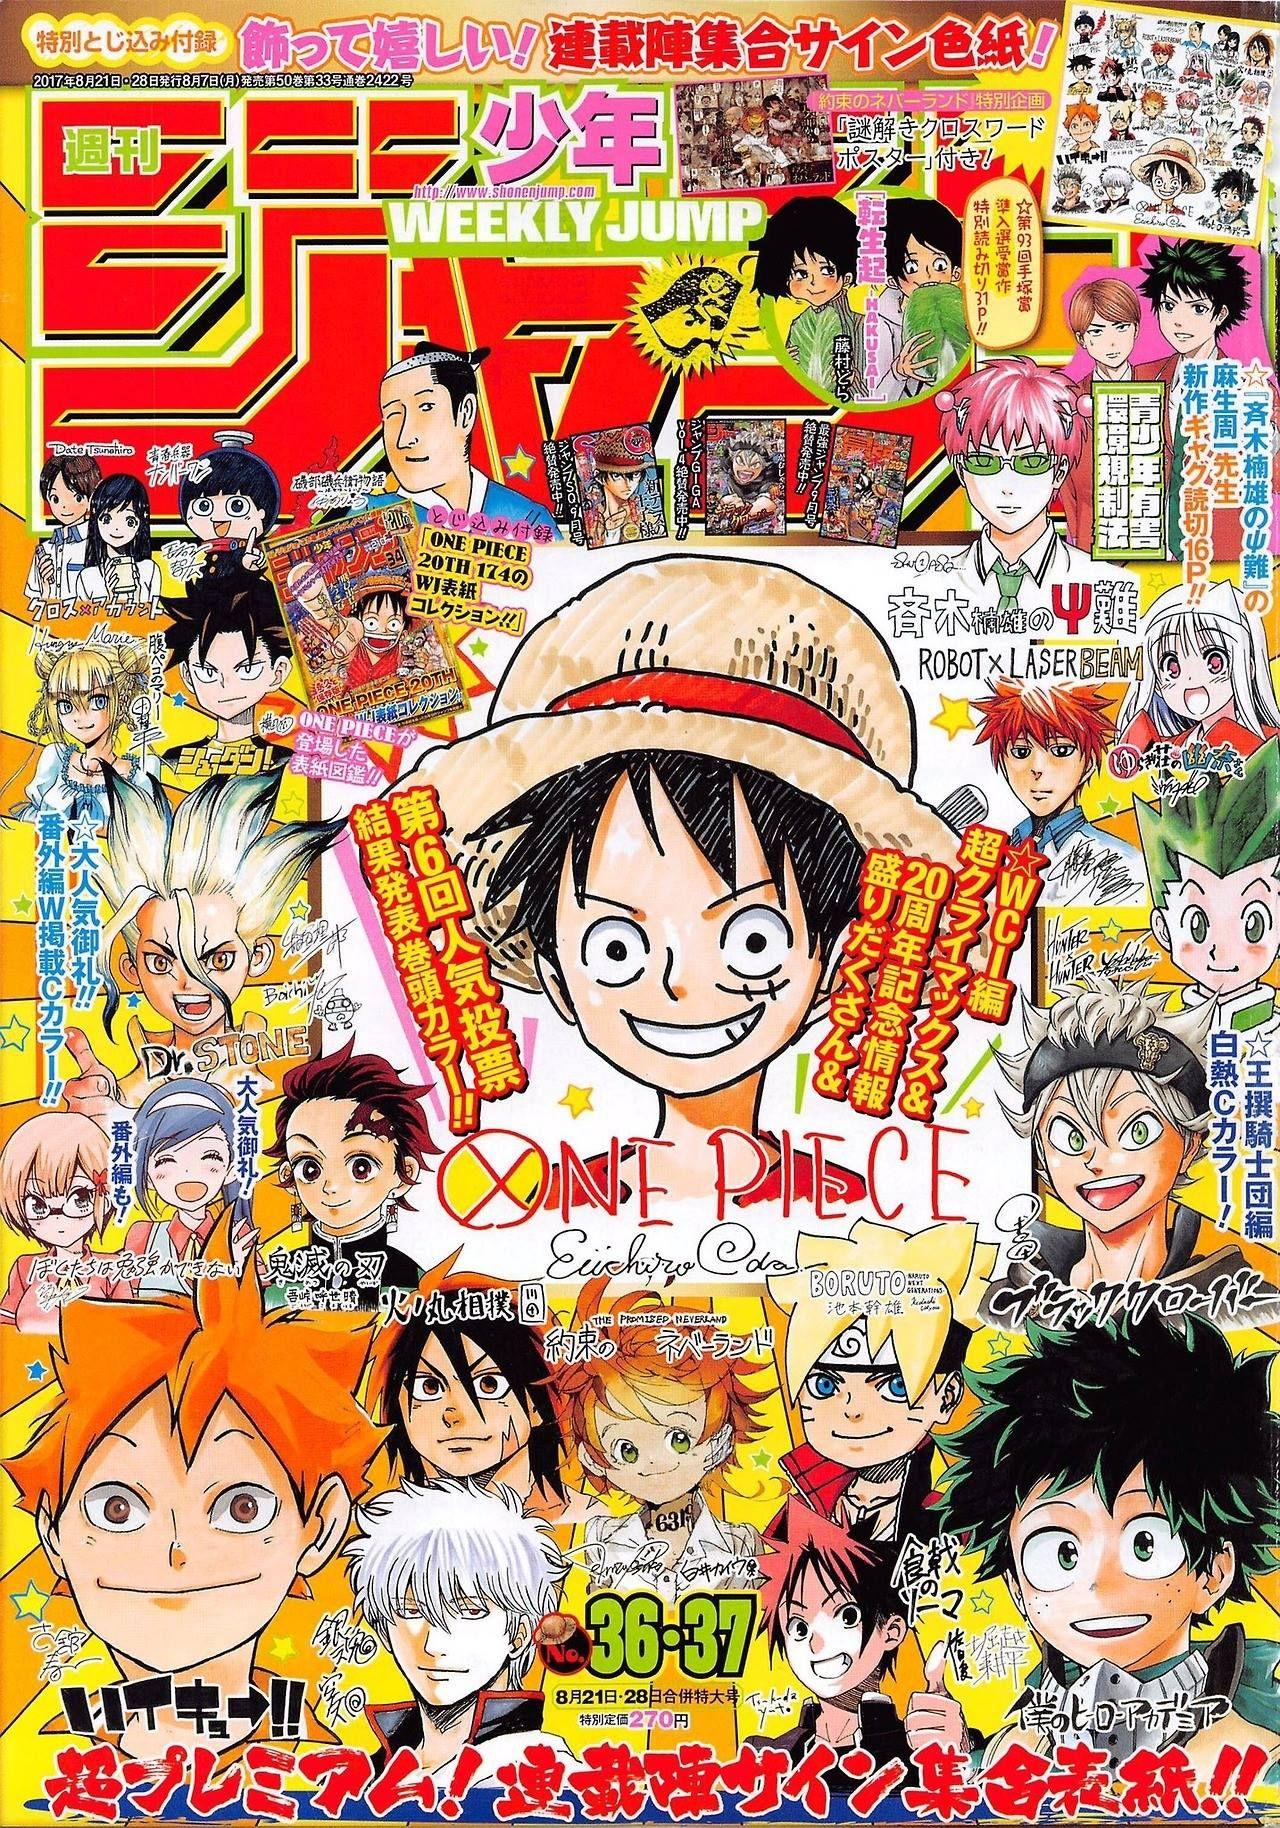 Weekly Shonen Jump #36/37 (07/08/2017)we | One Piece